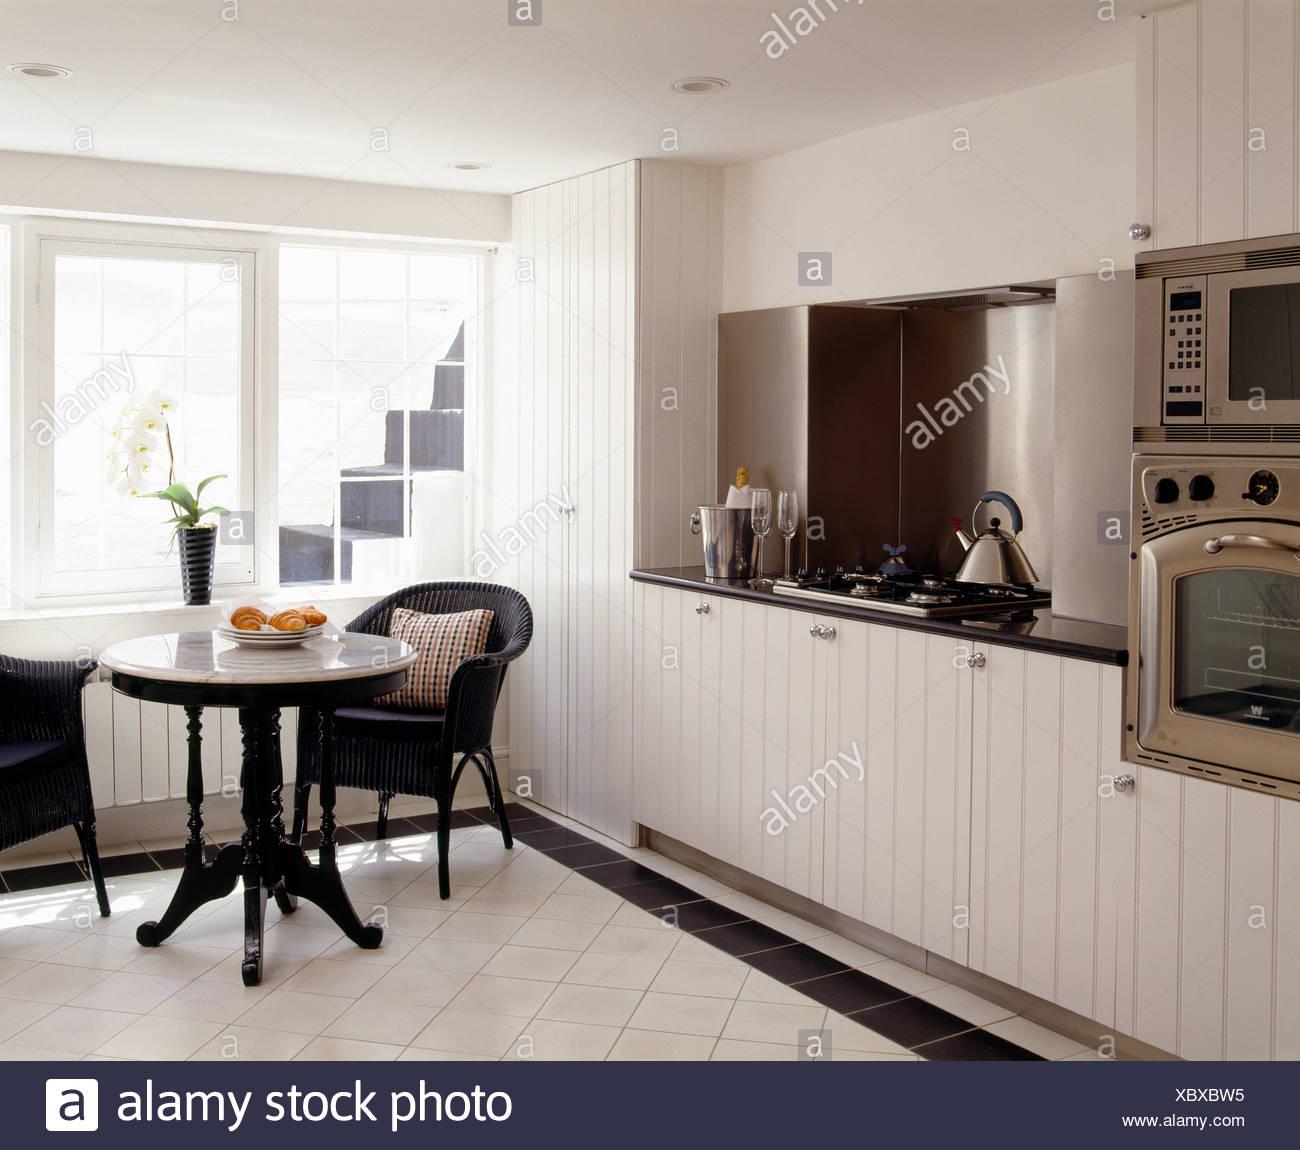 Cucina Bianca Moderna Con Tavolo Antico.Sedia In Vimini E Piccolo Tavolo Antico In Una Moderna Cucina Bianca